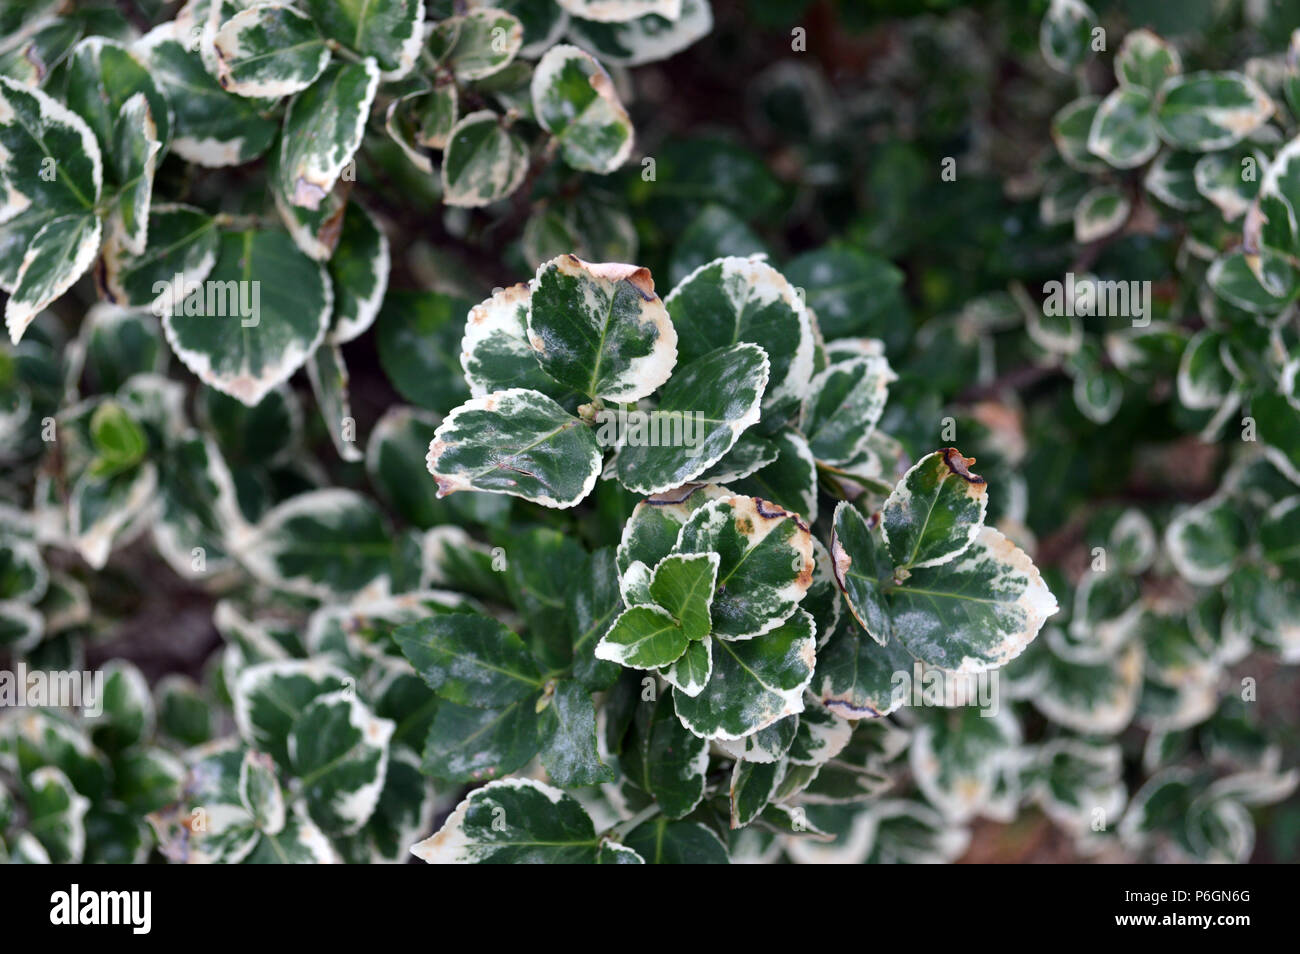 Emerald 'N Gold shrub close up detail - Stock Image